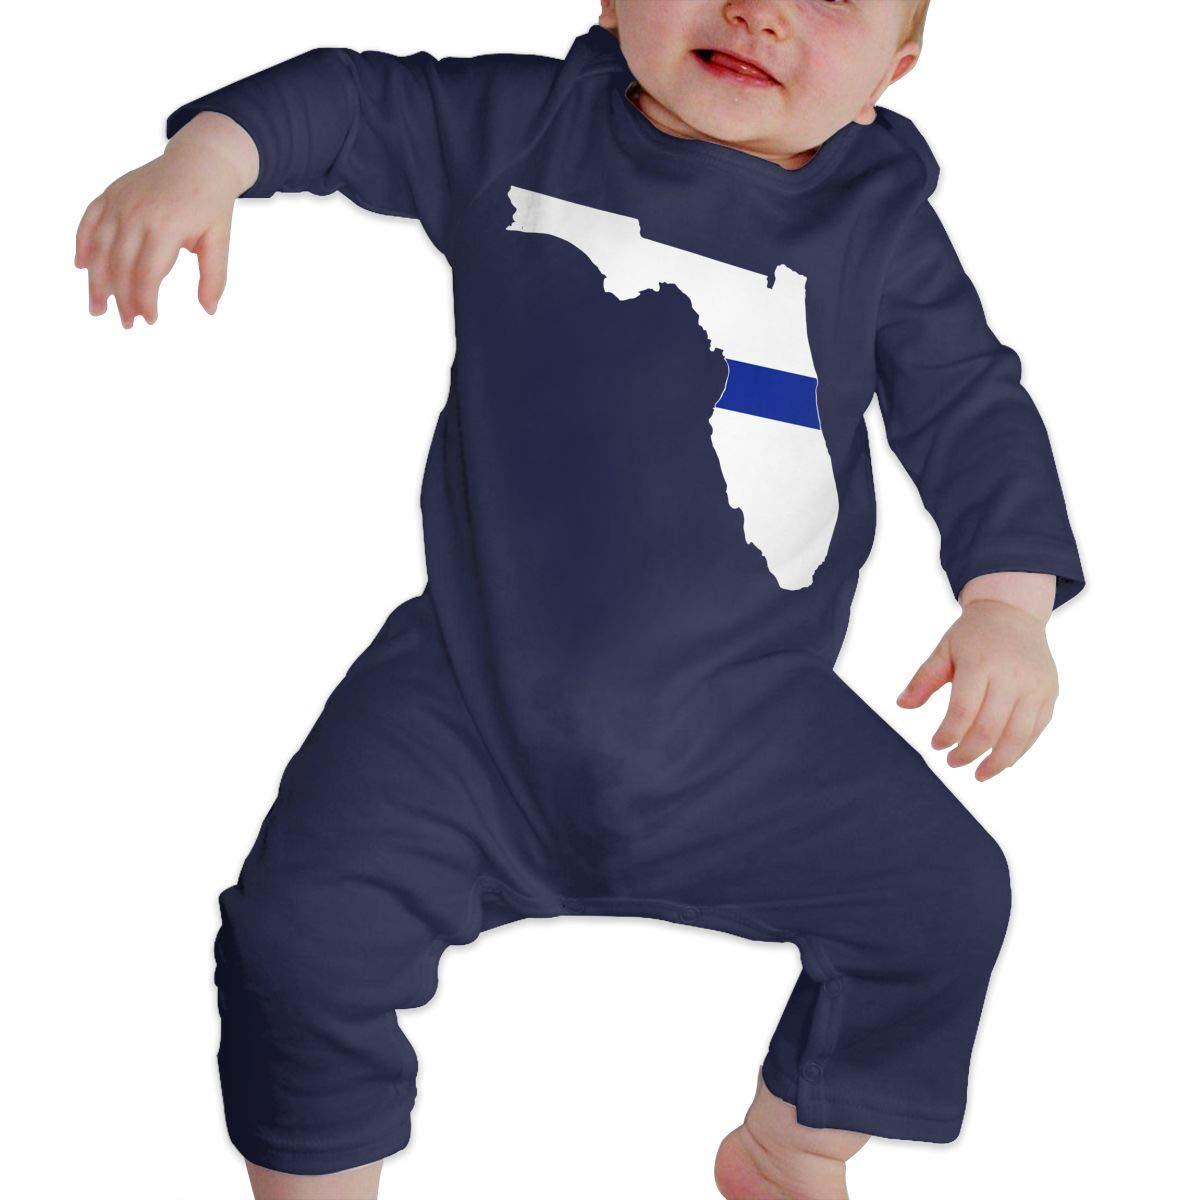 Florida-1 Newborn Baby Girl Infant Soft /& Breathable Romper Jumpsuit Bodysuit Thin Blue Line